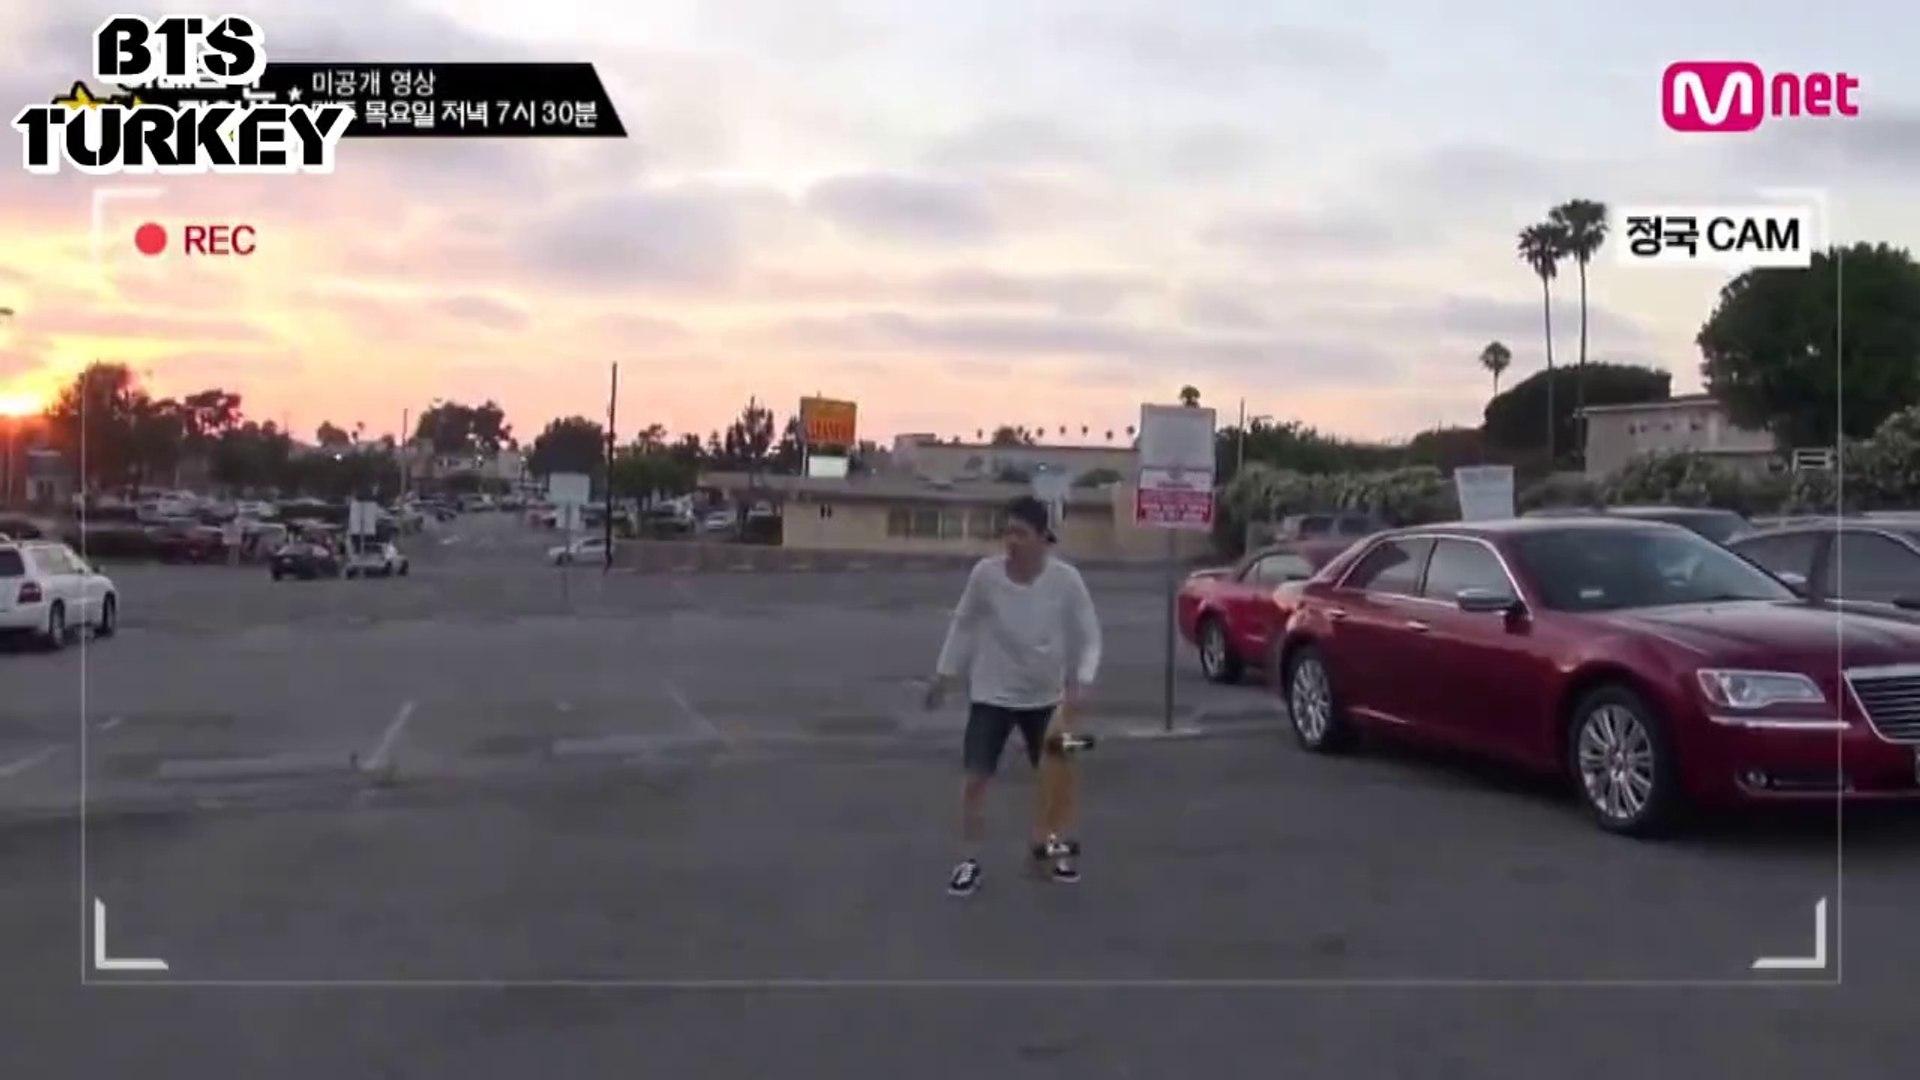 [Türkçe Altyazılı] American Hustle Life Ep.3 Unreleased Cut: BTS V,Suga ,Jungkook Acrobatics Skatebo